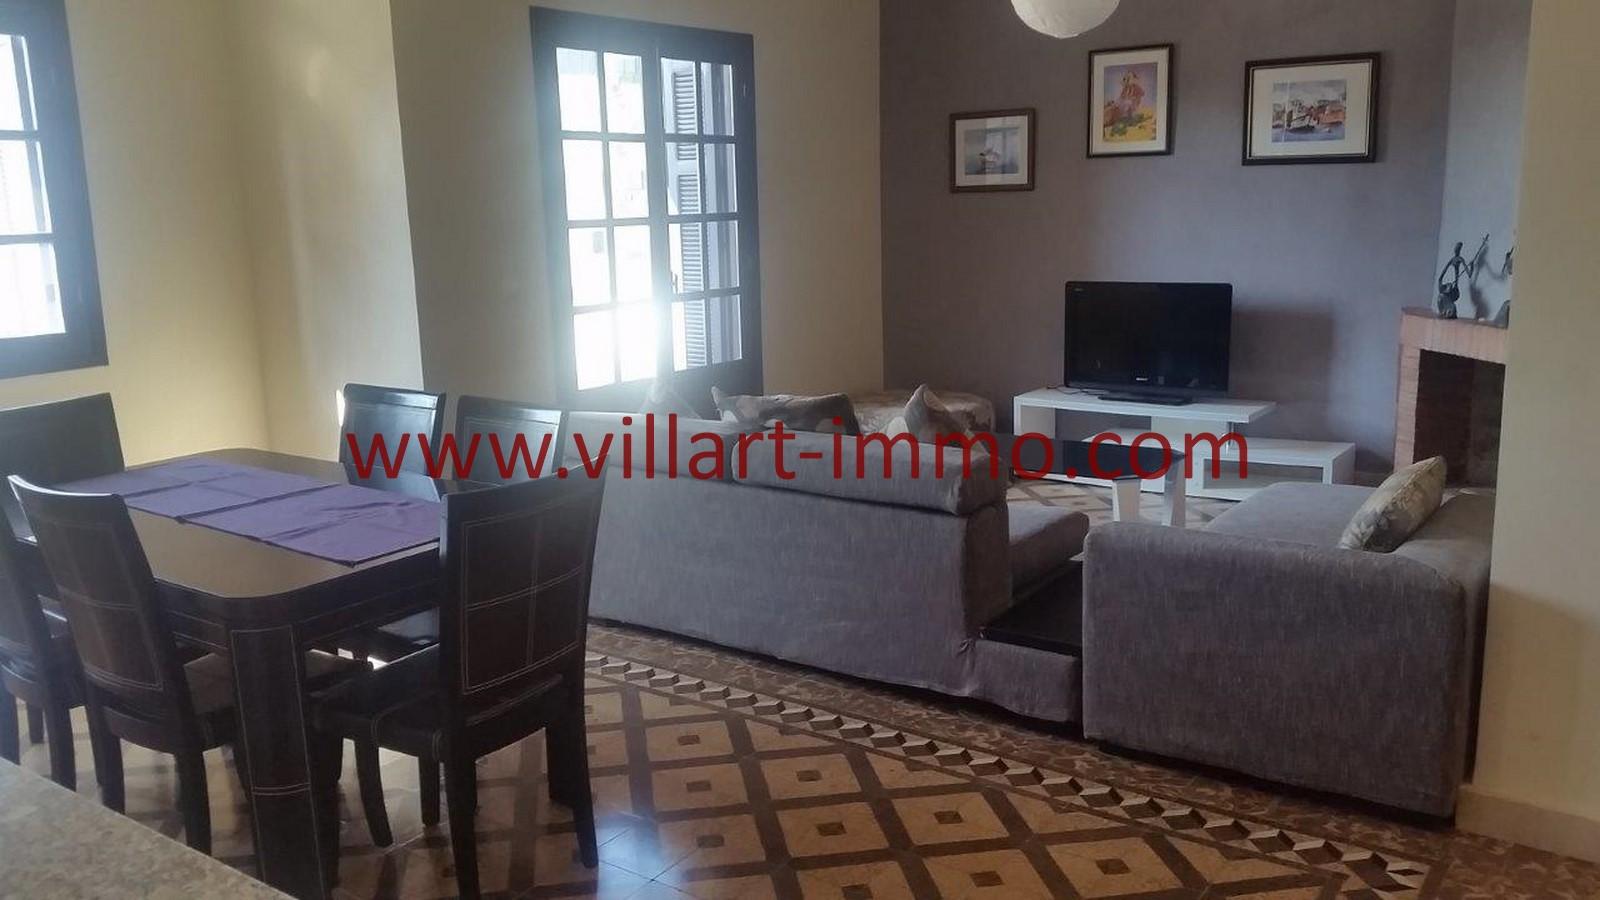 1-location-appartement-meuble-centre-ville-tanger-salle-a-manger-l965-villart-immo